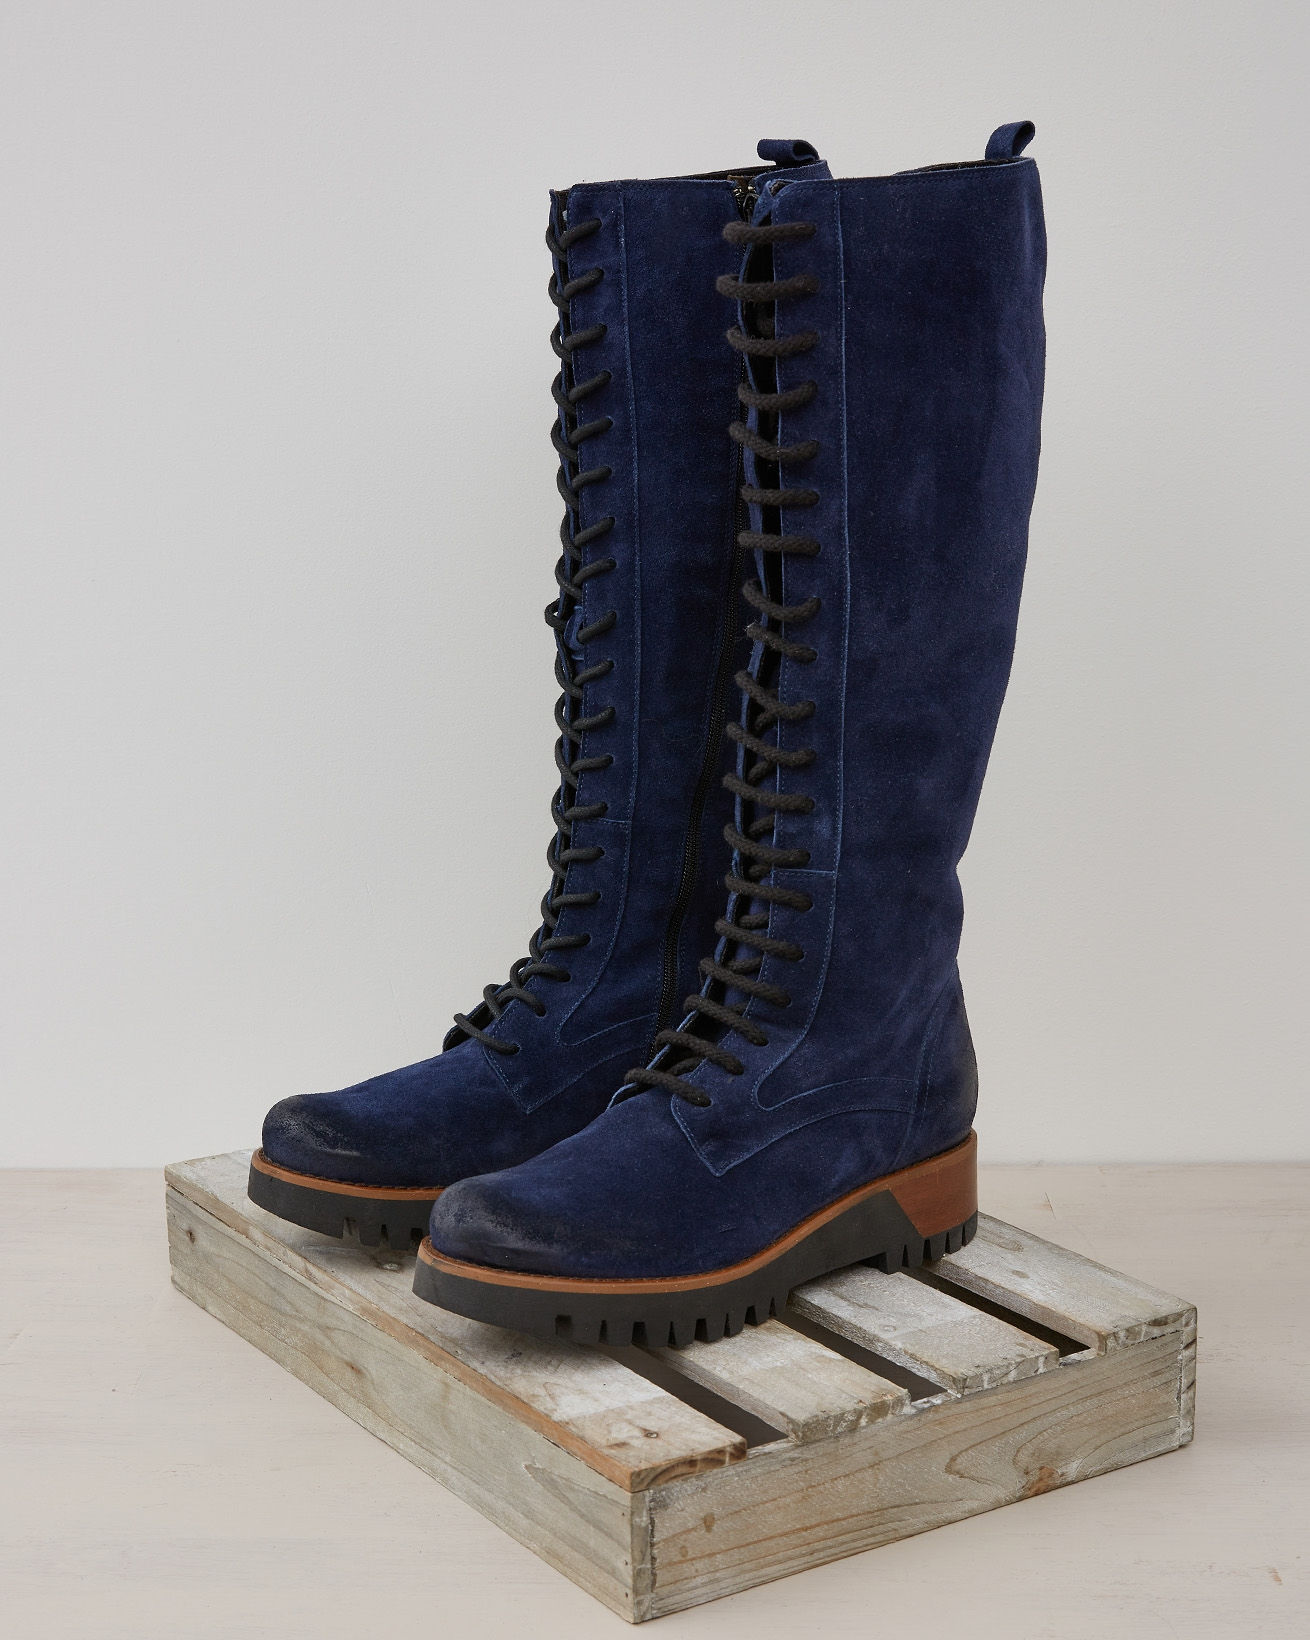 WILDERNESS KNEE HIGH BOOT - NAVY - Size 37 - 2549